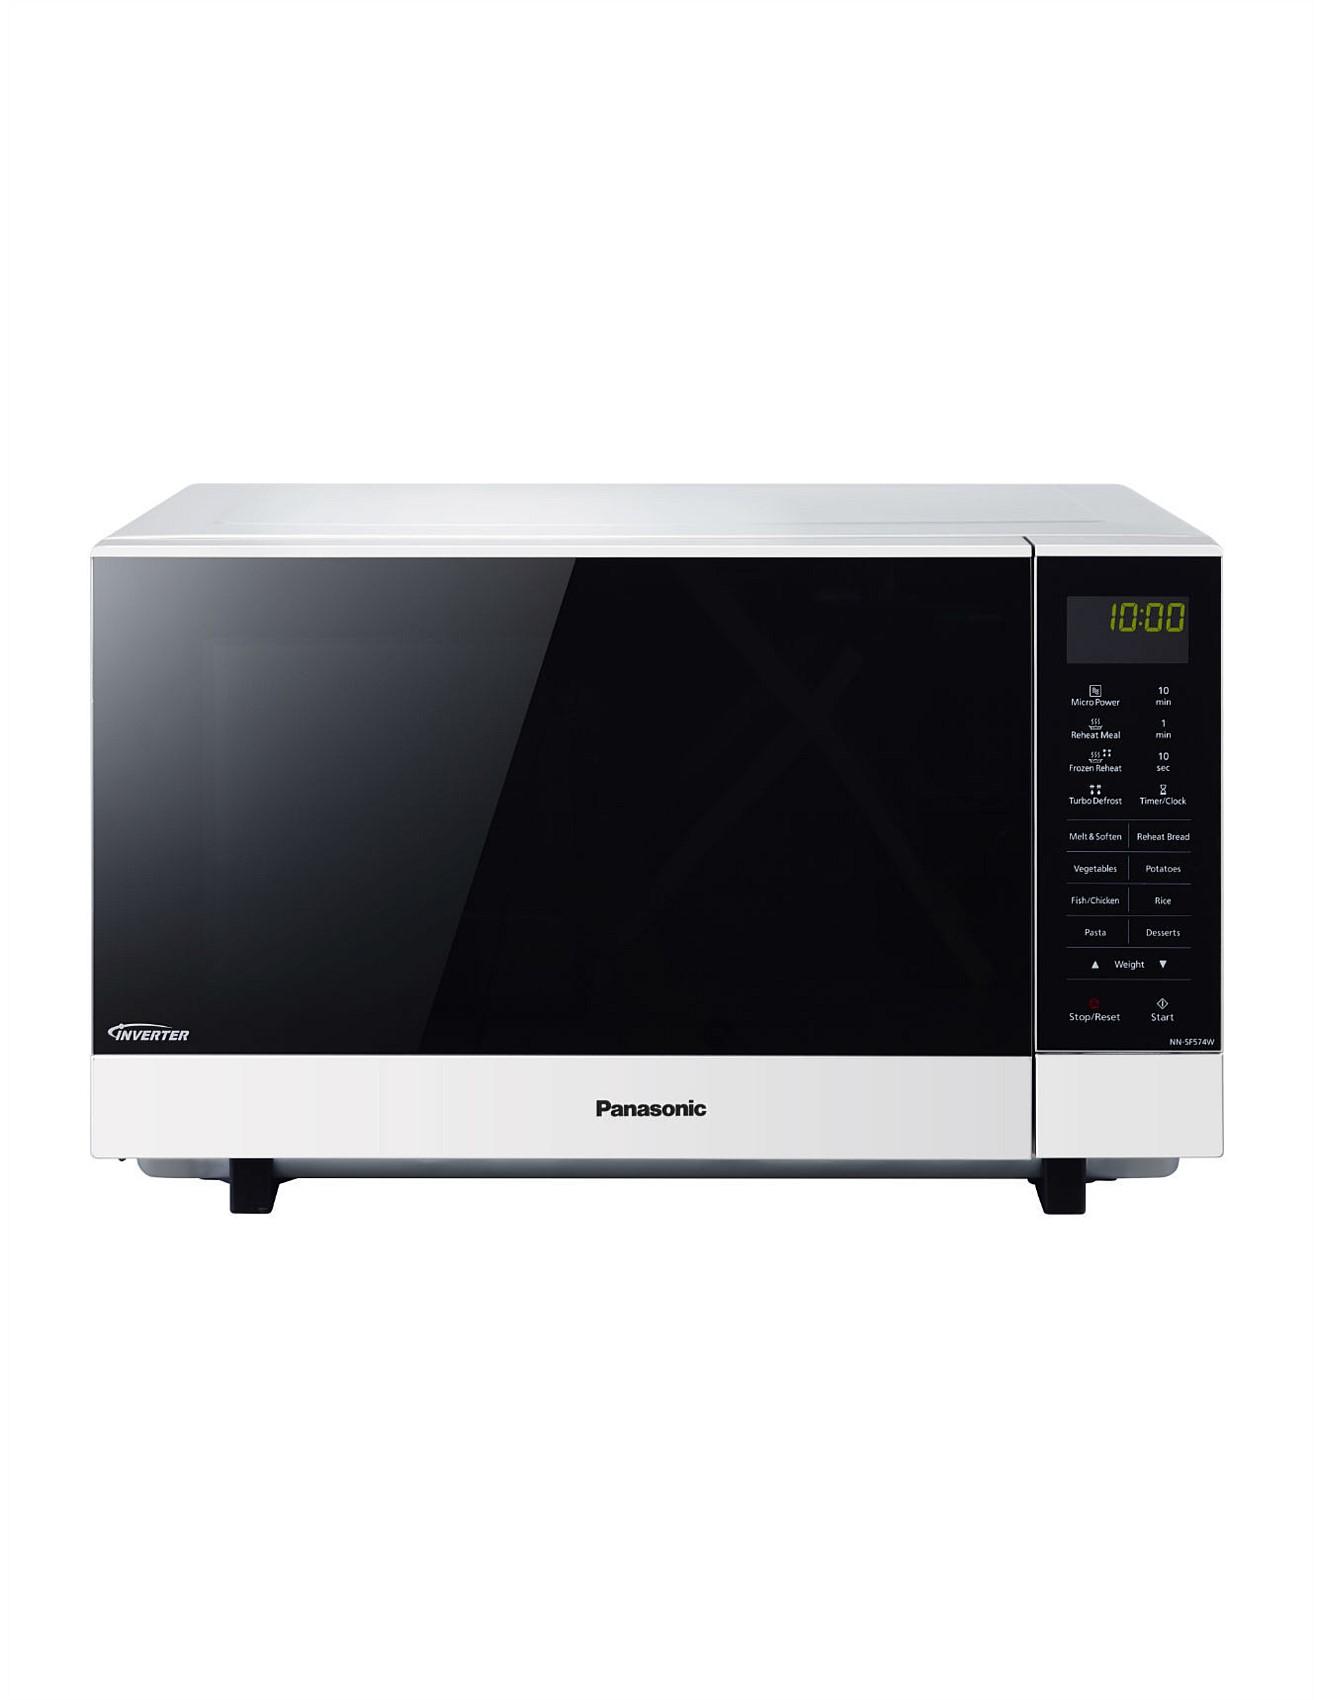 Microwaves | Buy Microwave Ovens Online | David Jones - NNSF564WQPQ 27L Solo Flatbed Microwave Oven